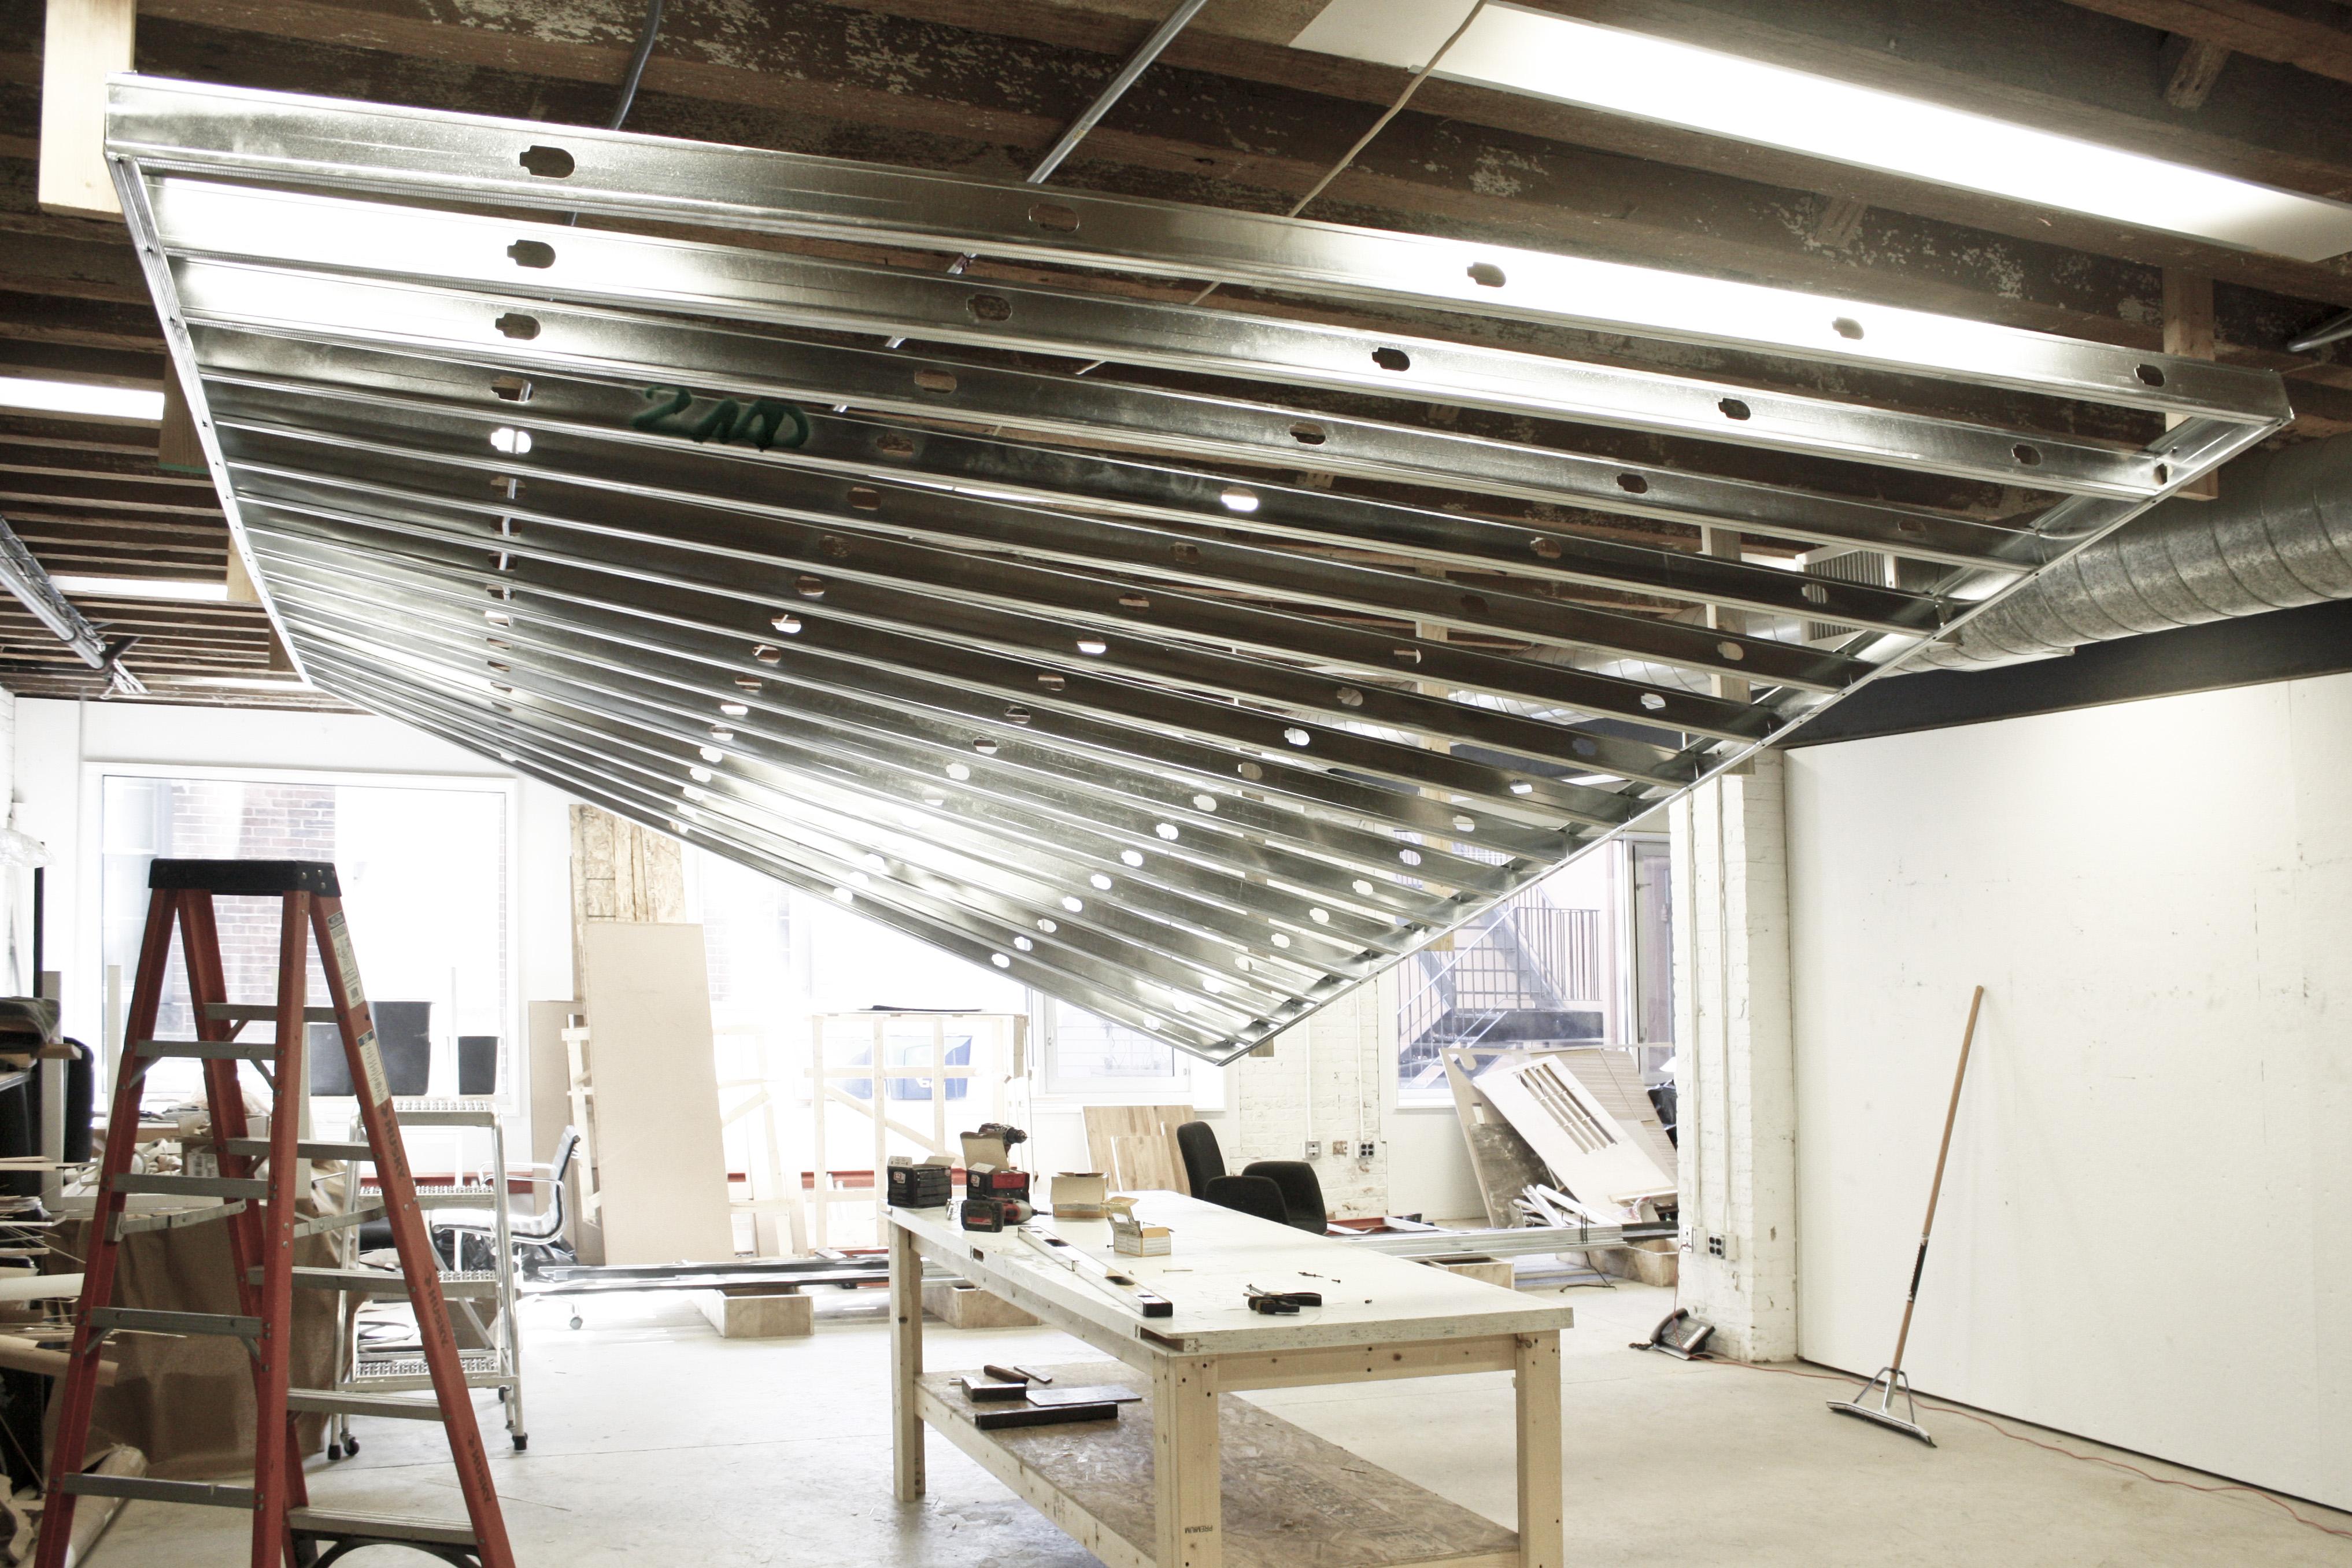 Nadaaa Blog 187 Dfald Hyperbolic Paraboloid Ceiling Mock Up